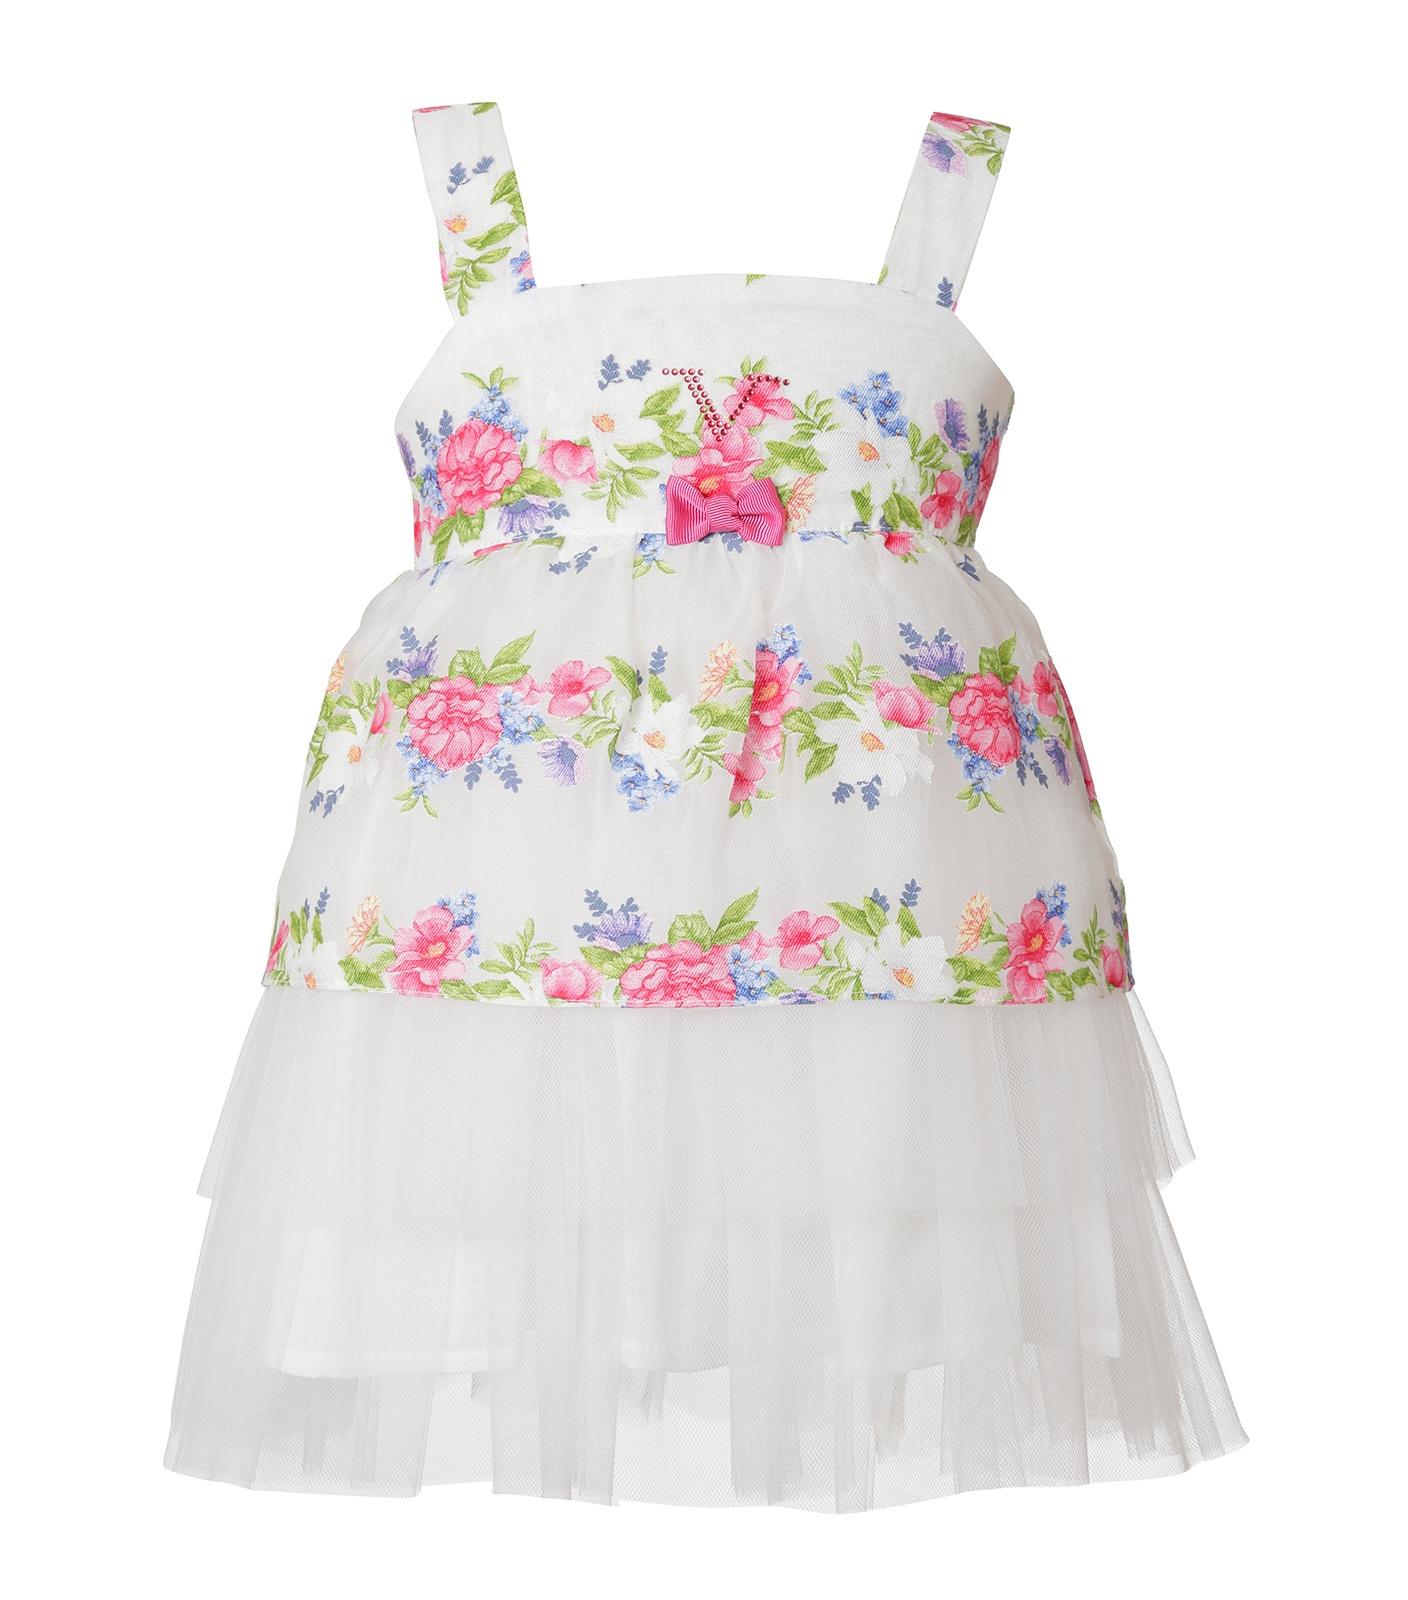 Dress Versace 19 69 Baby Girl